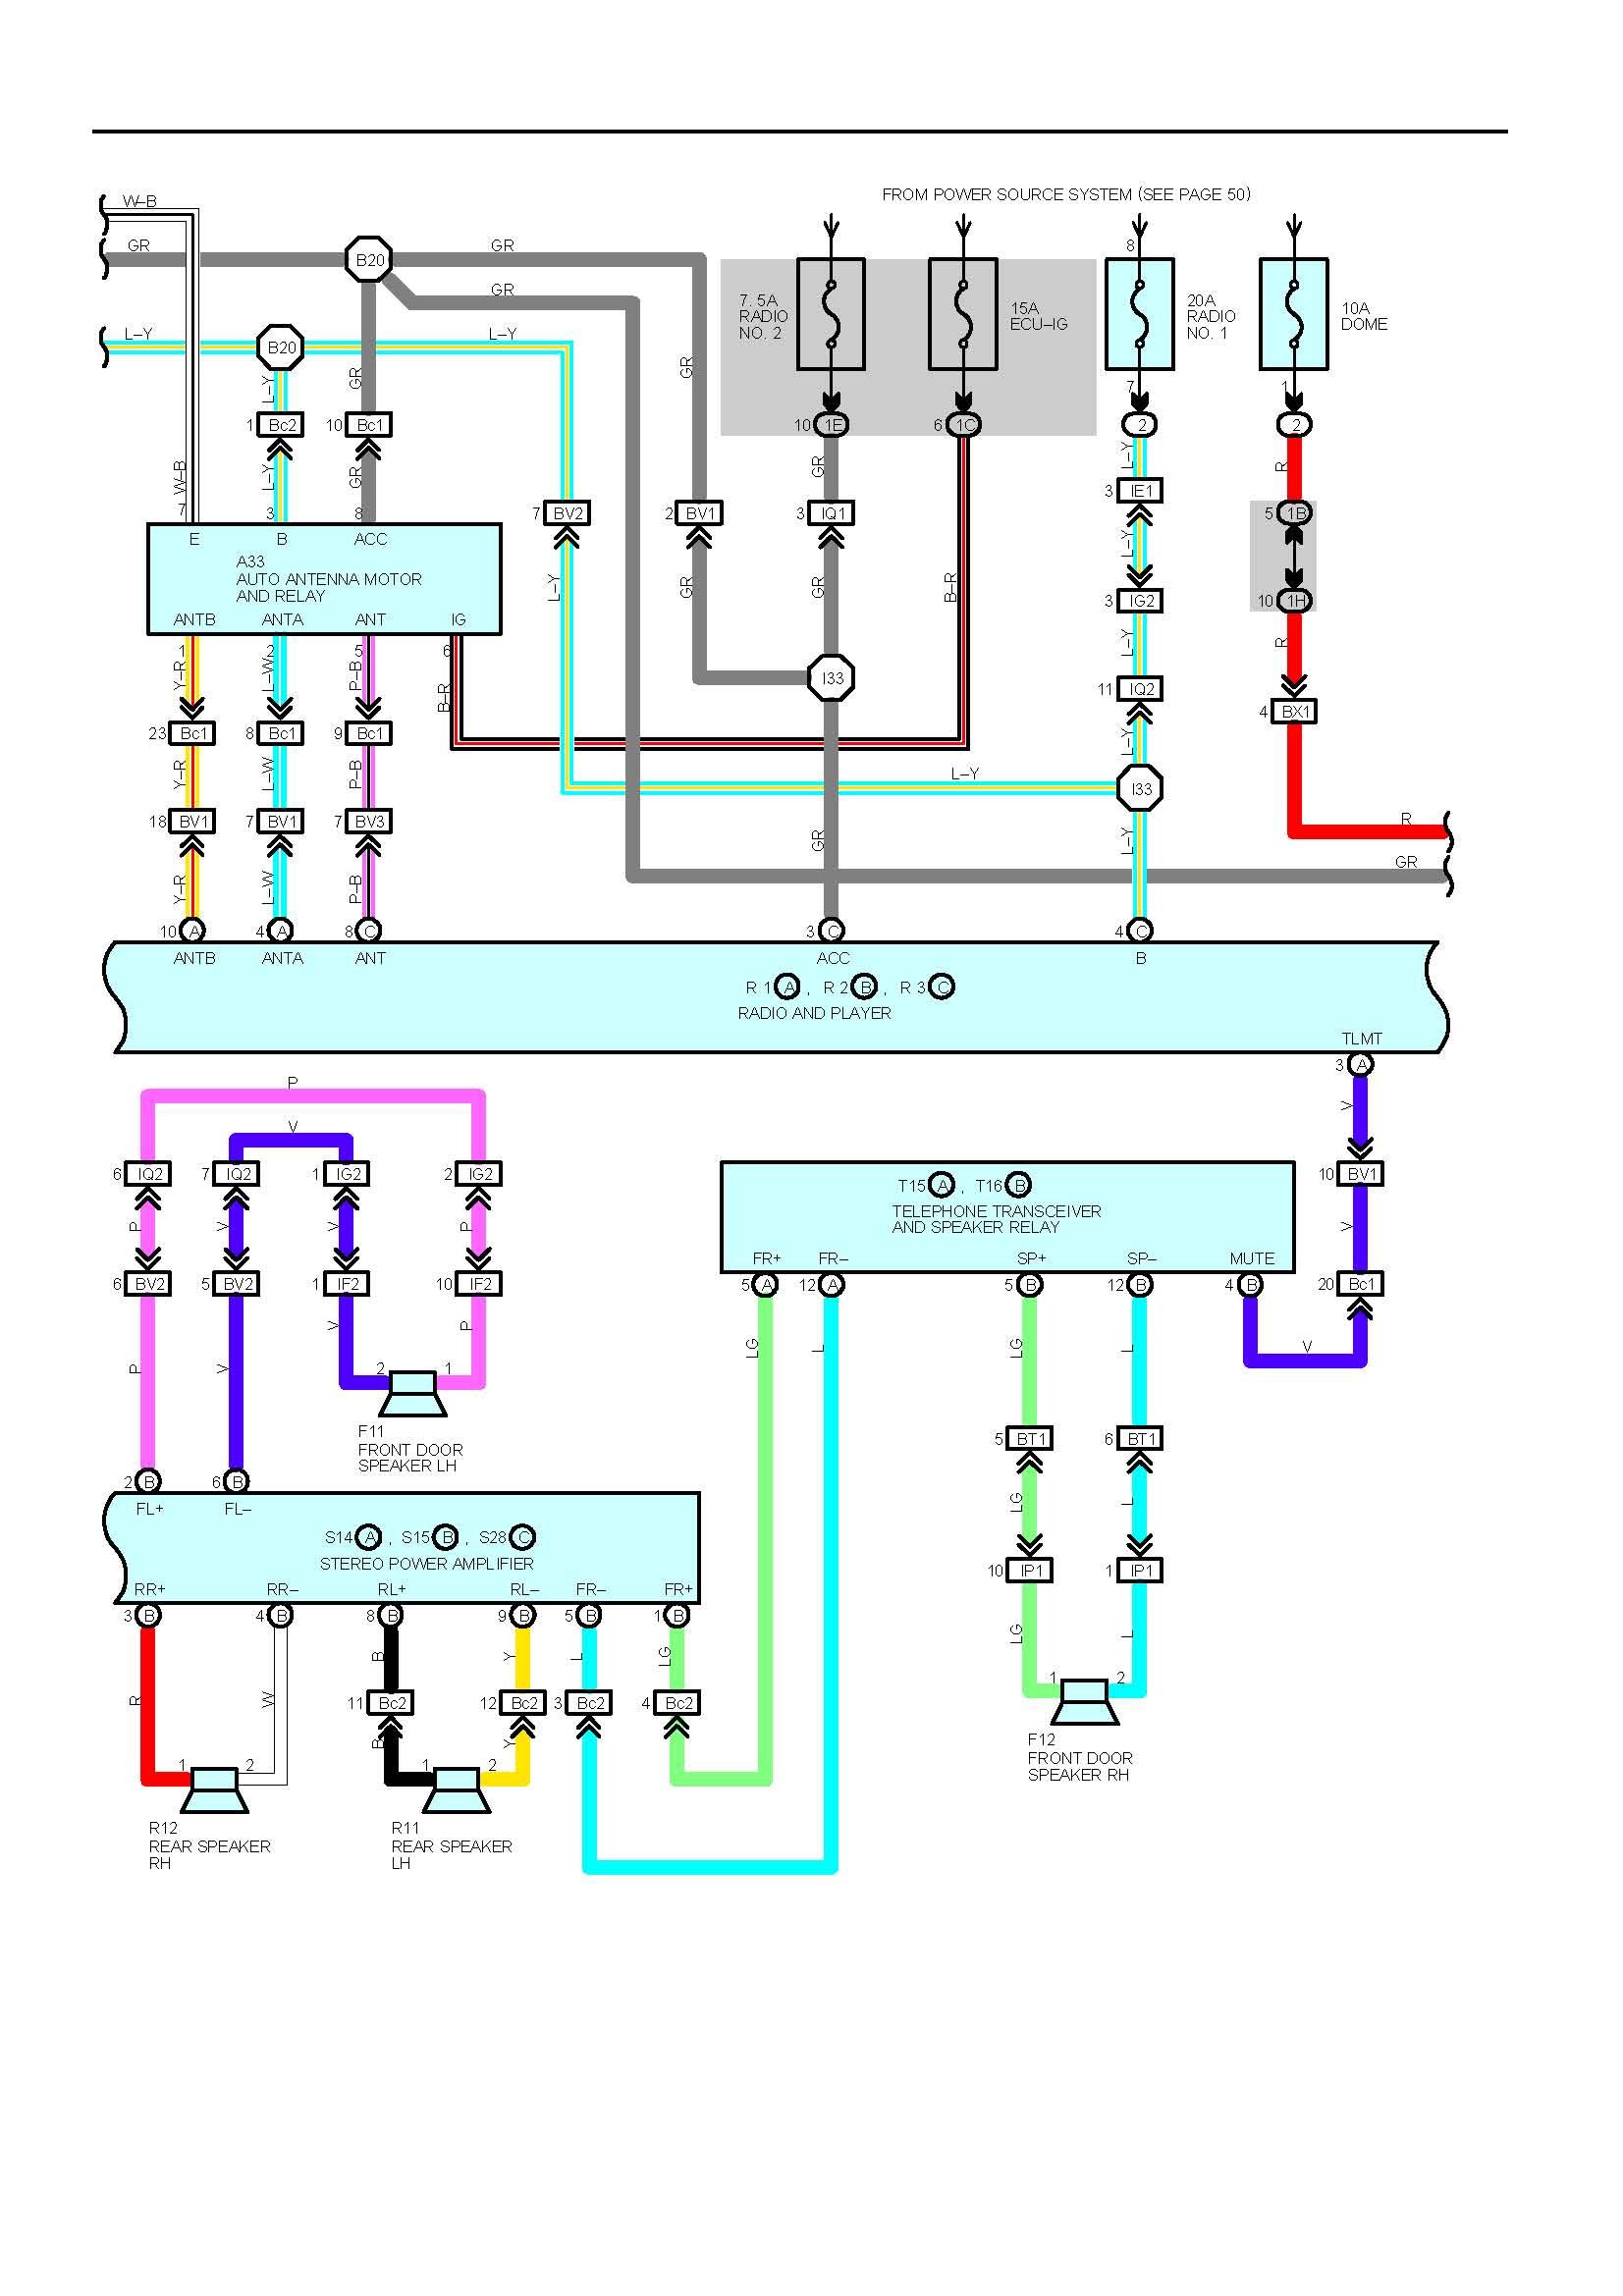 Glamorous Dodge P55056321ad Wiring Diagram Gallery - Best Image ...